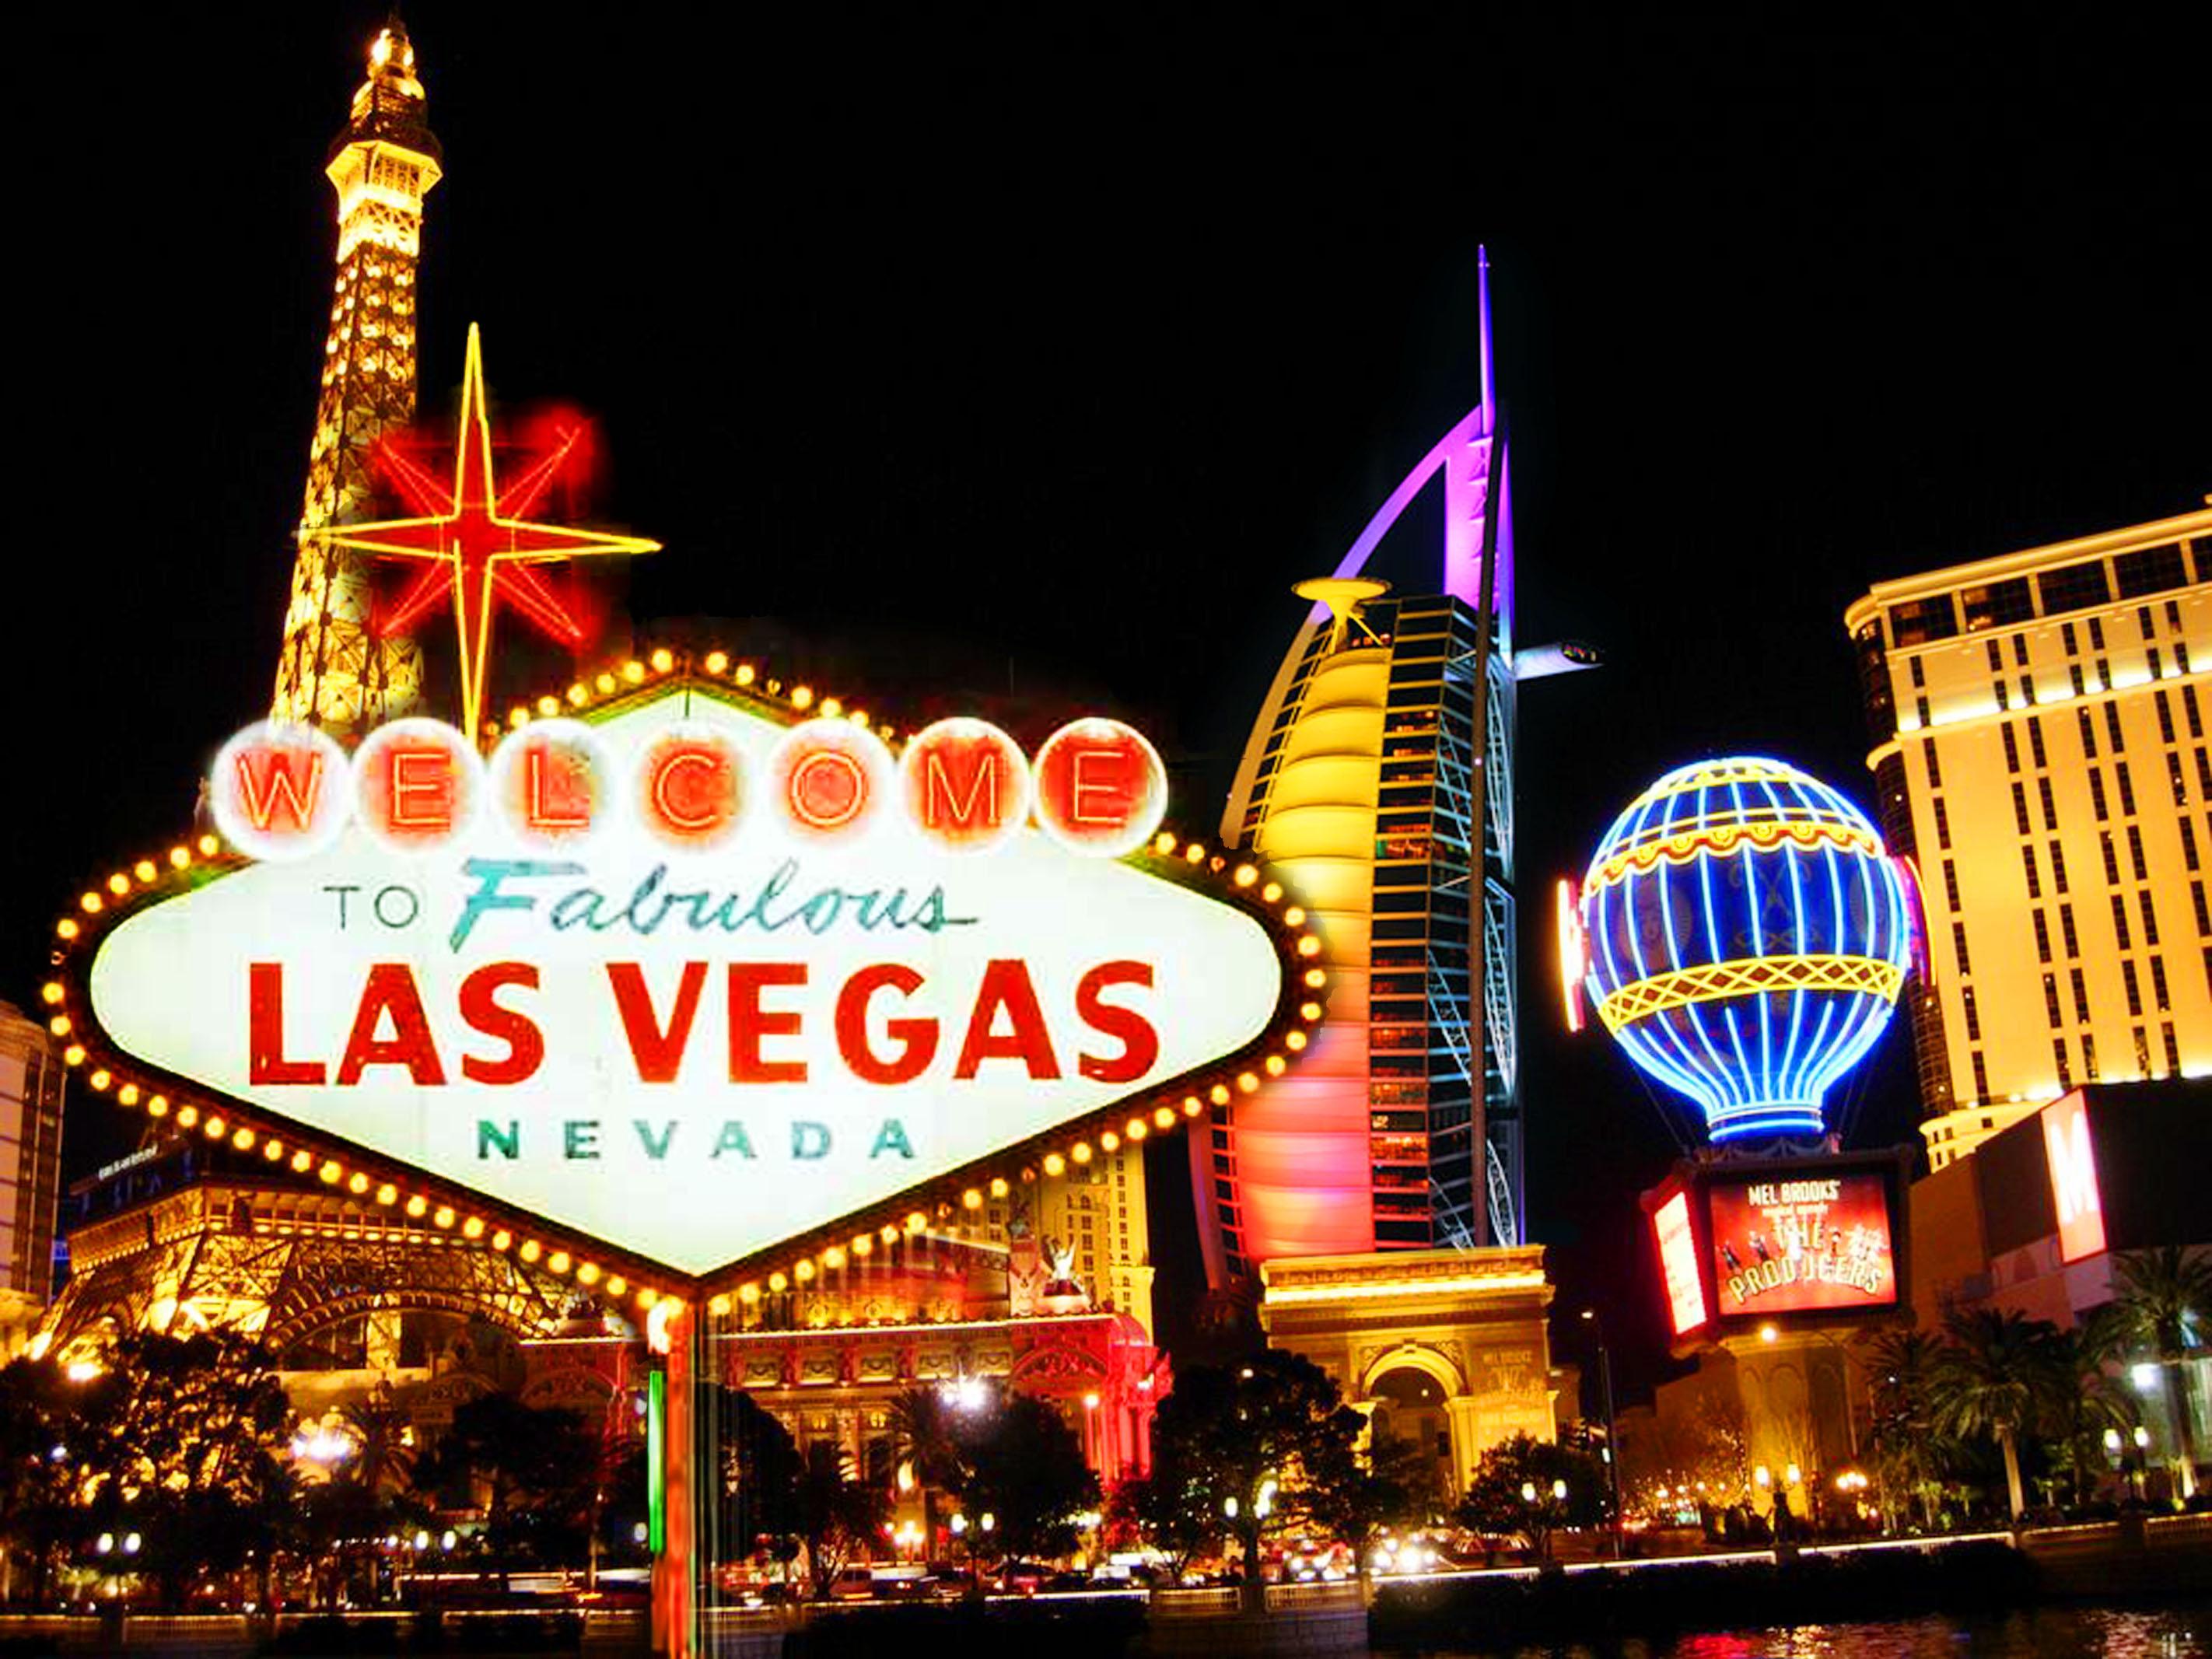 Khám phá Las Vegas từ A-Z | Travel688